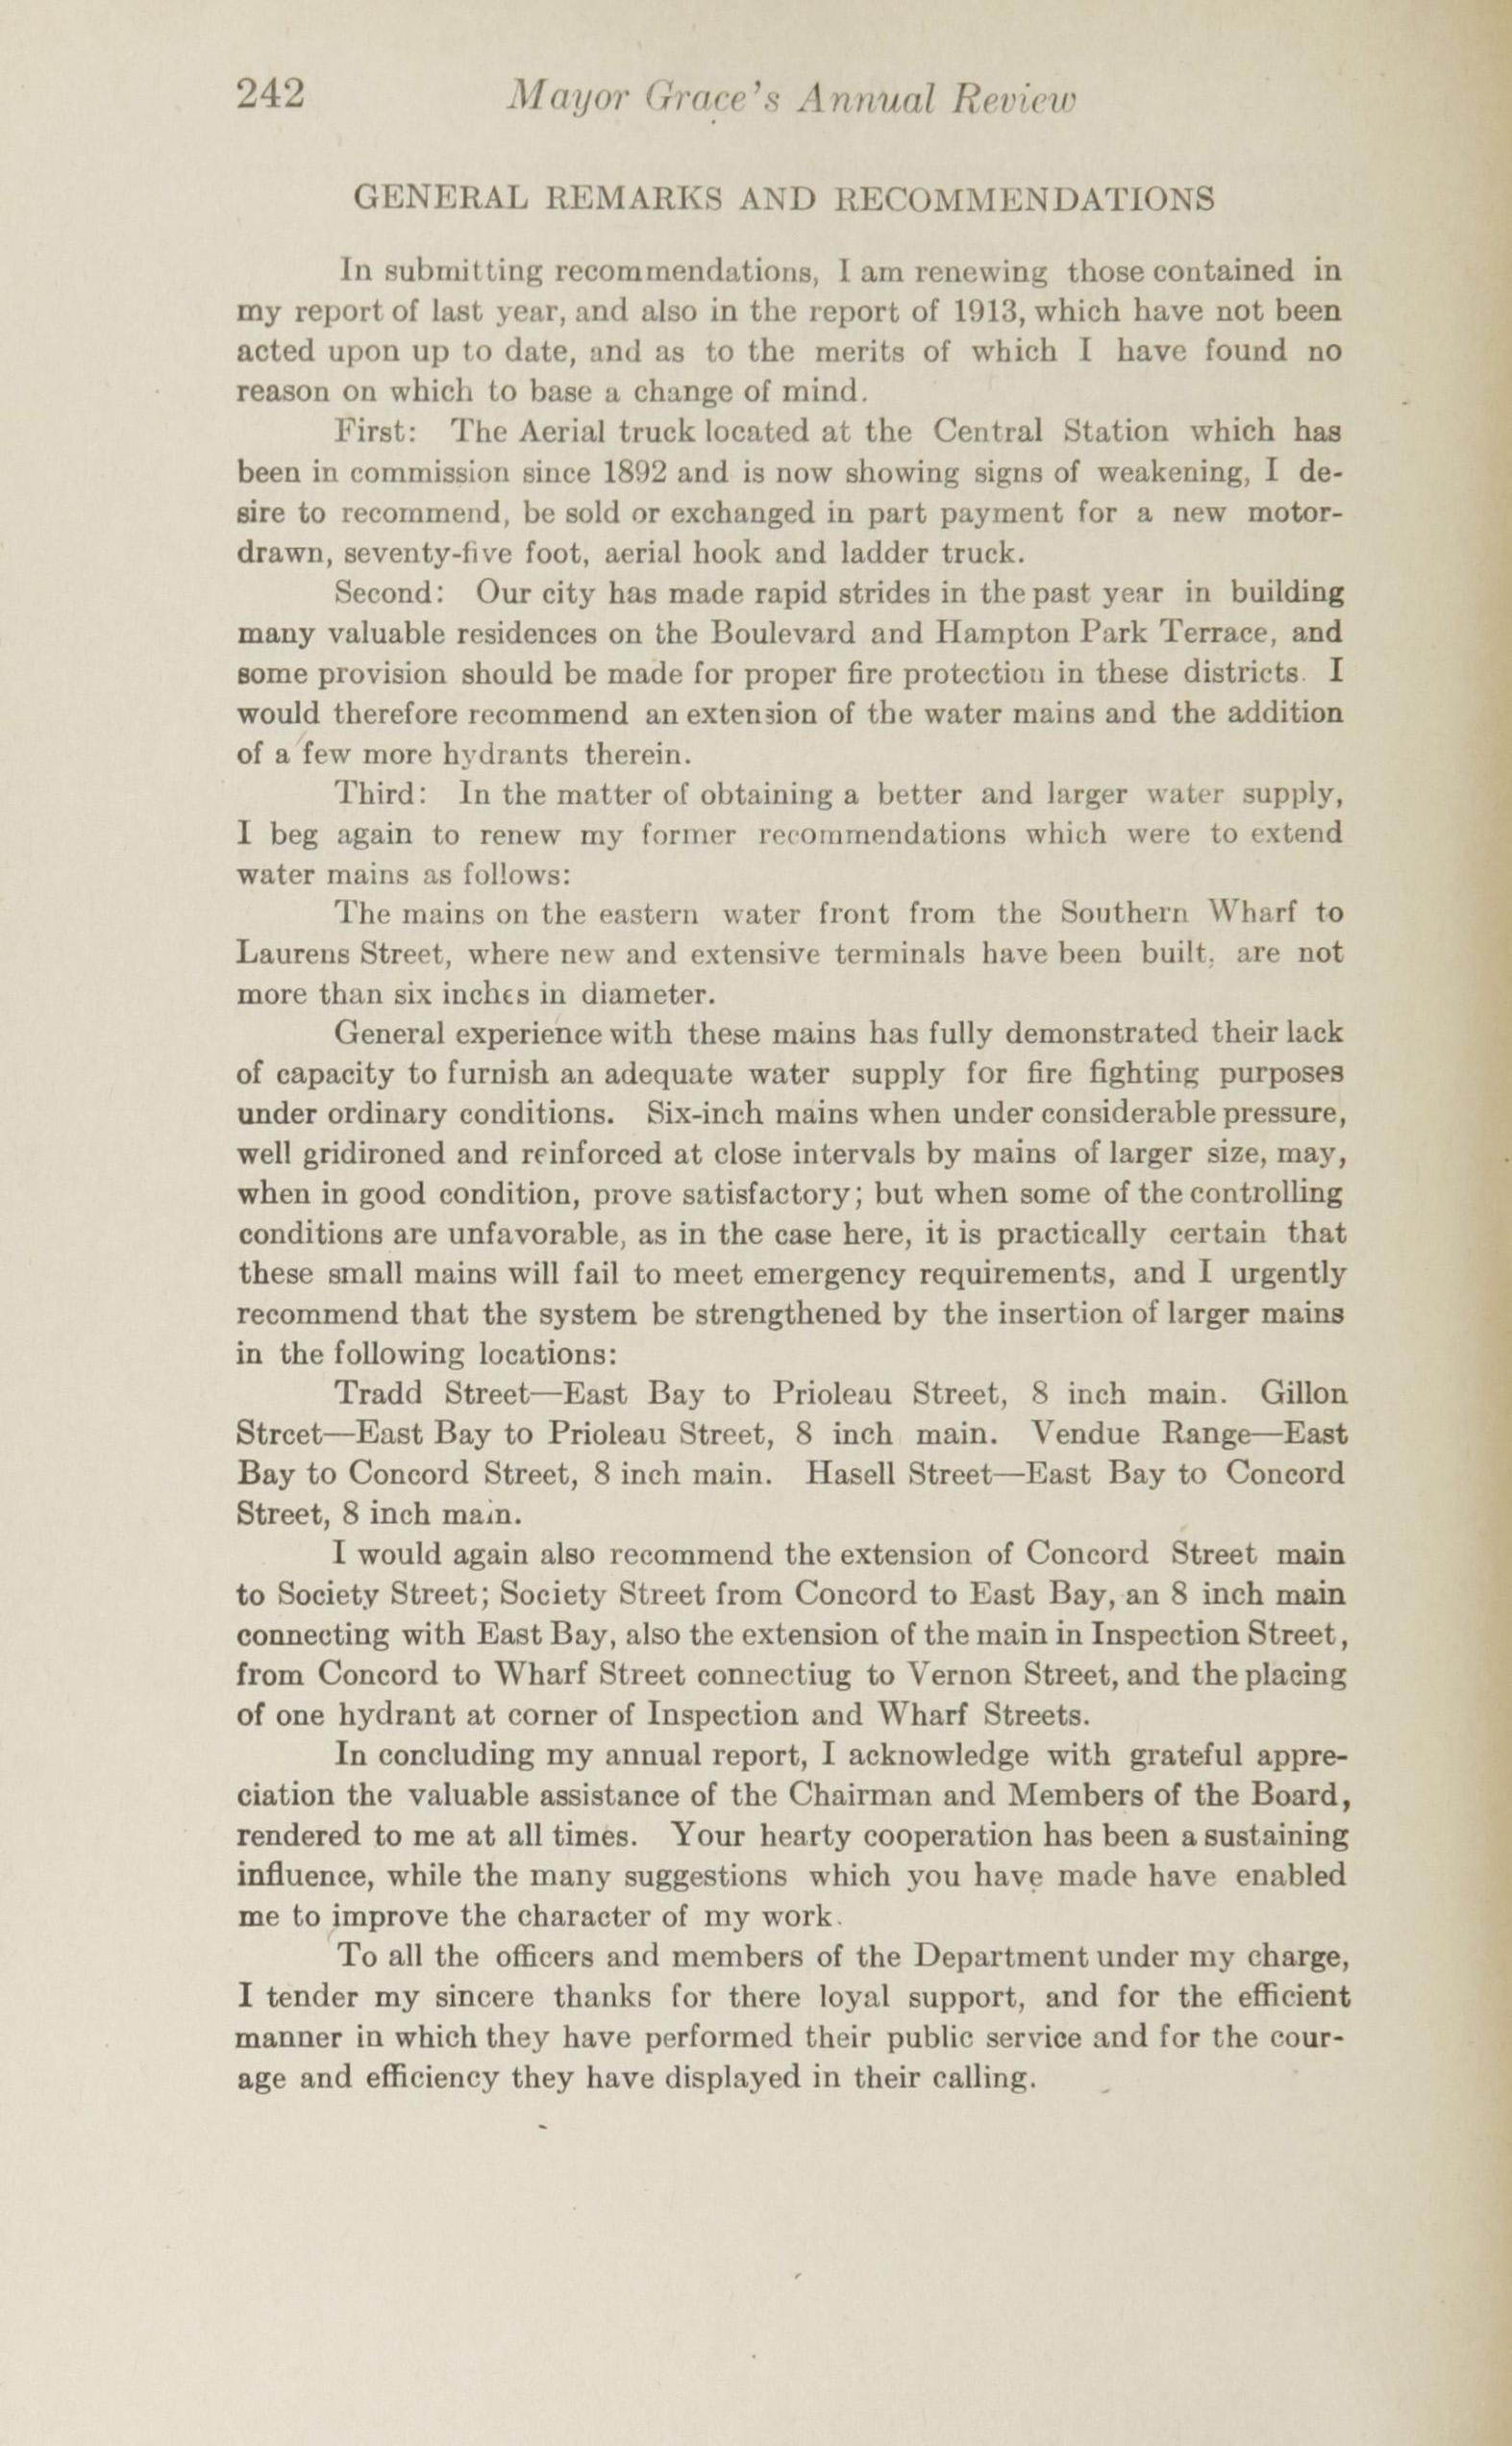 Charleston Yearbook, 1915, page 242